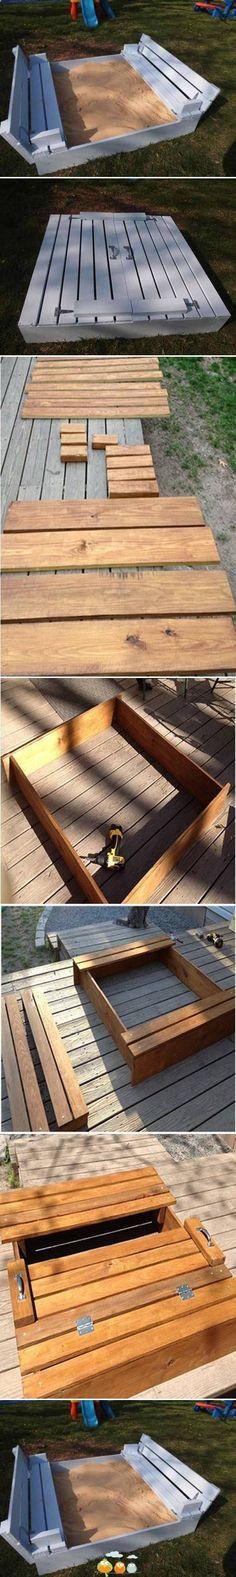 Sandkiste aus alten Paletten - DIY - 30 Amazing Uses For Old Pallets Pallet Crafts, Pallet Projects, Wood Crafts, Projects To Try, Diy Pallet, Pallet Ideas, Garden Pallet, Wooden Garden, Weekend Projects